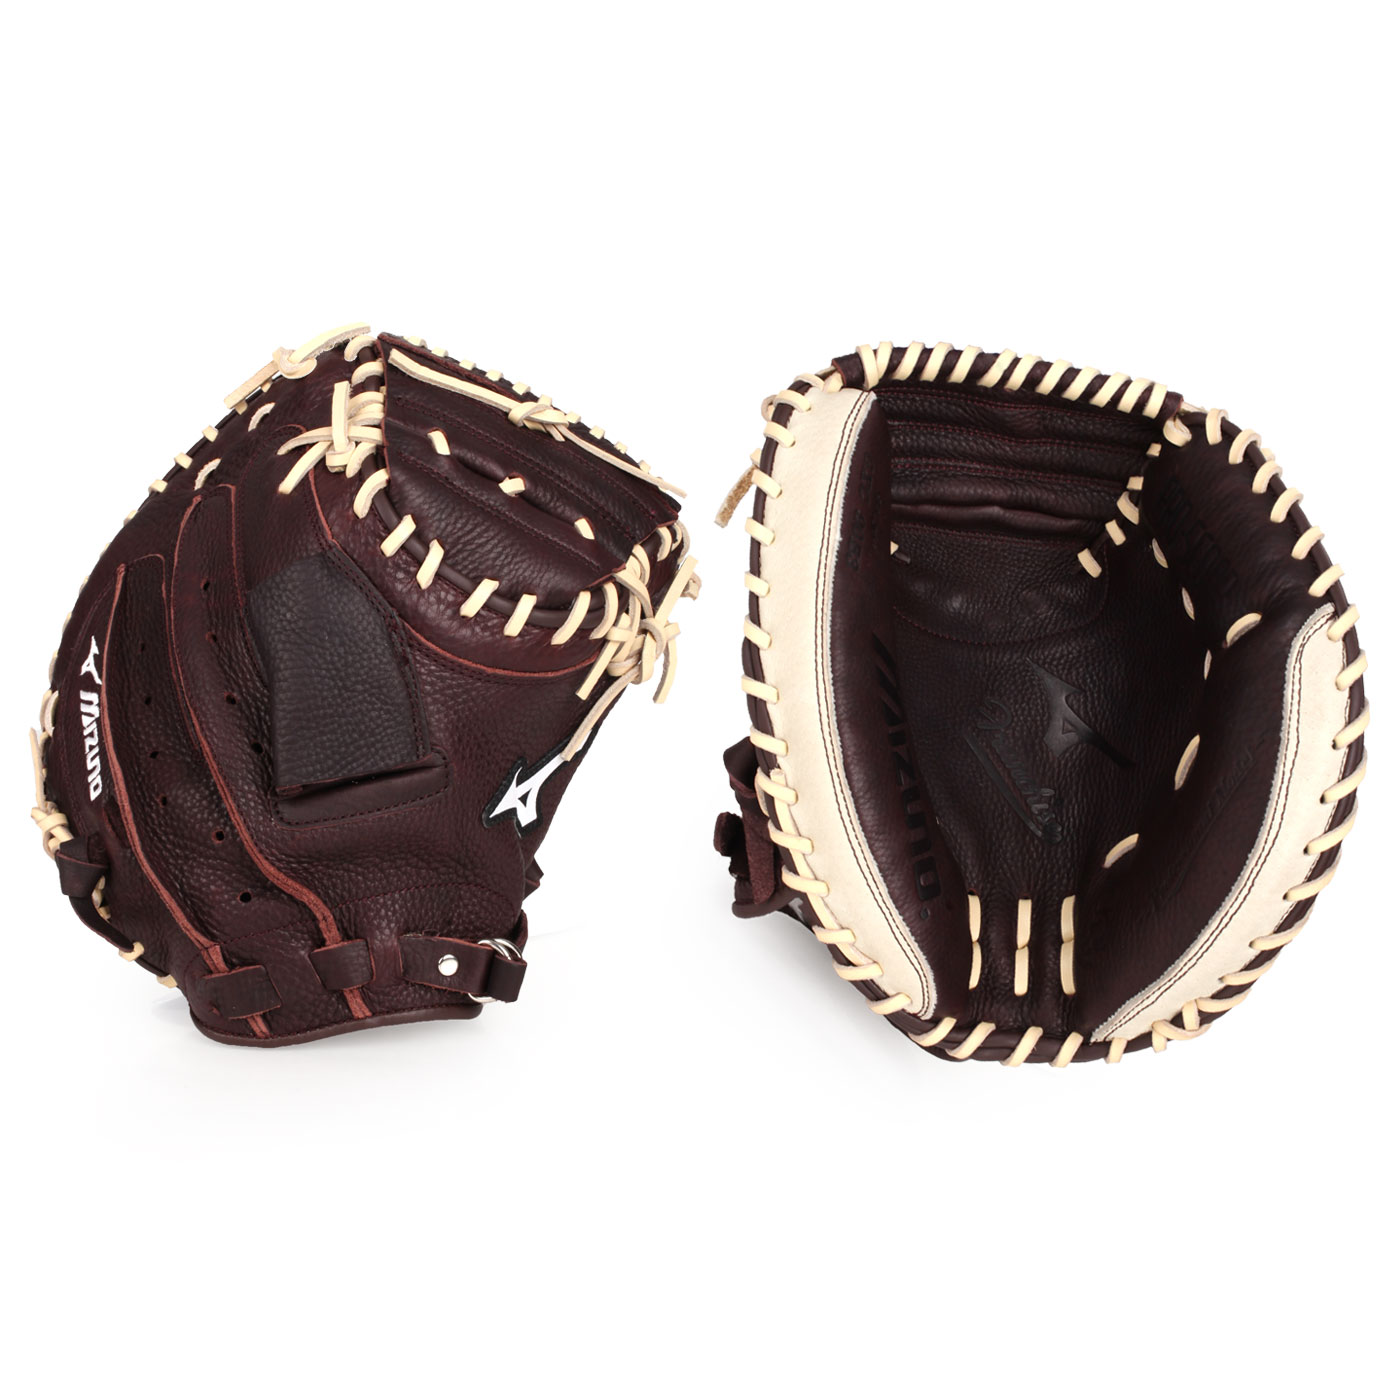 MIZUNO 棒球捕手手套(右投) 312736-R - 深咖啡棕